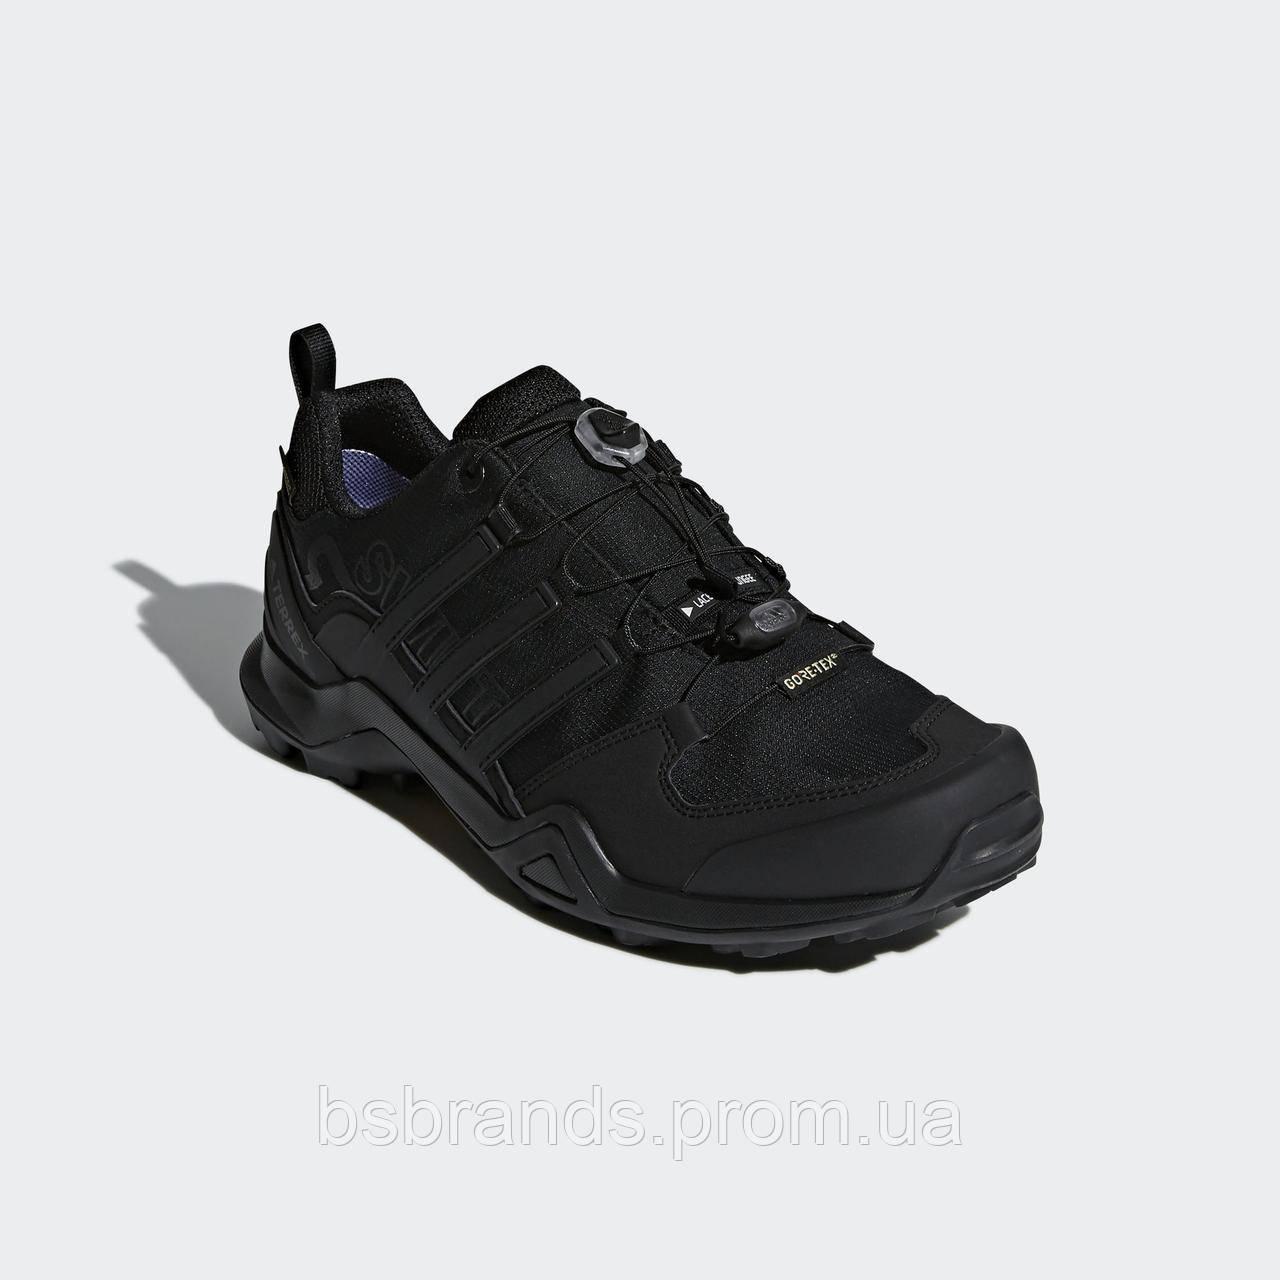 Мужские кроссовки Adidas TERREX SWIFT R2 GTX (Артикул:CM7492)